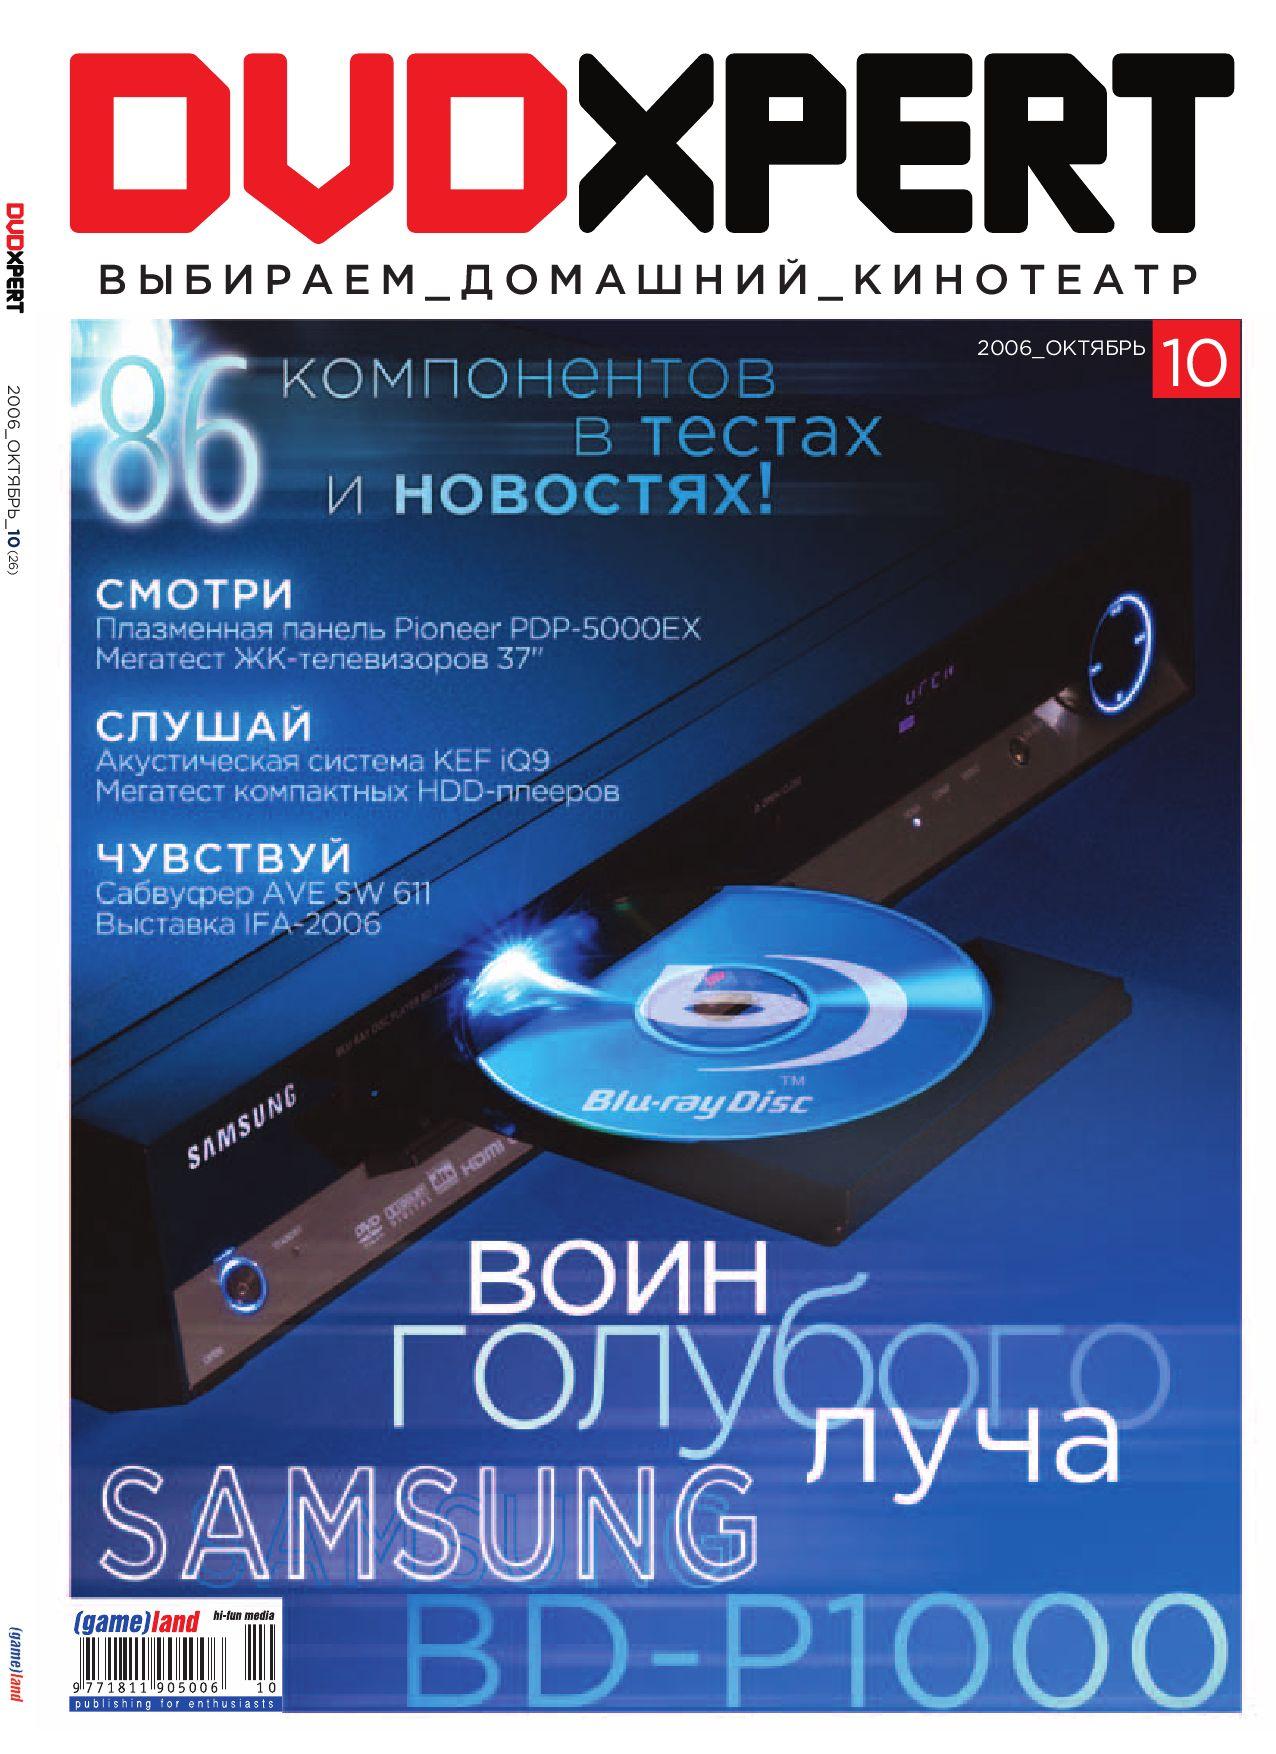 Инструкция dvd teckton 111